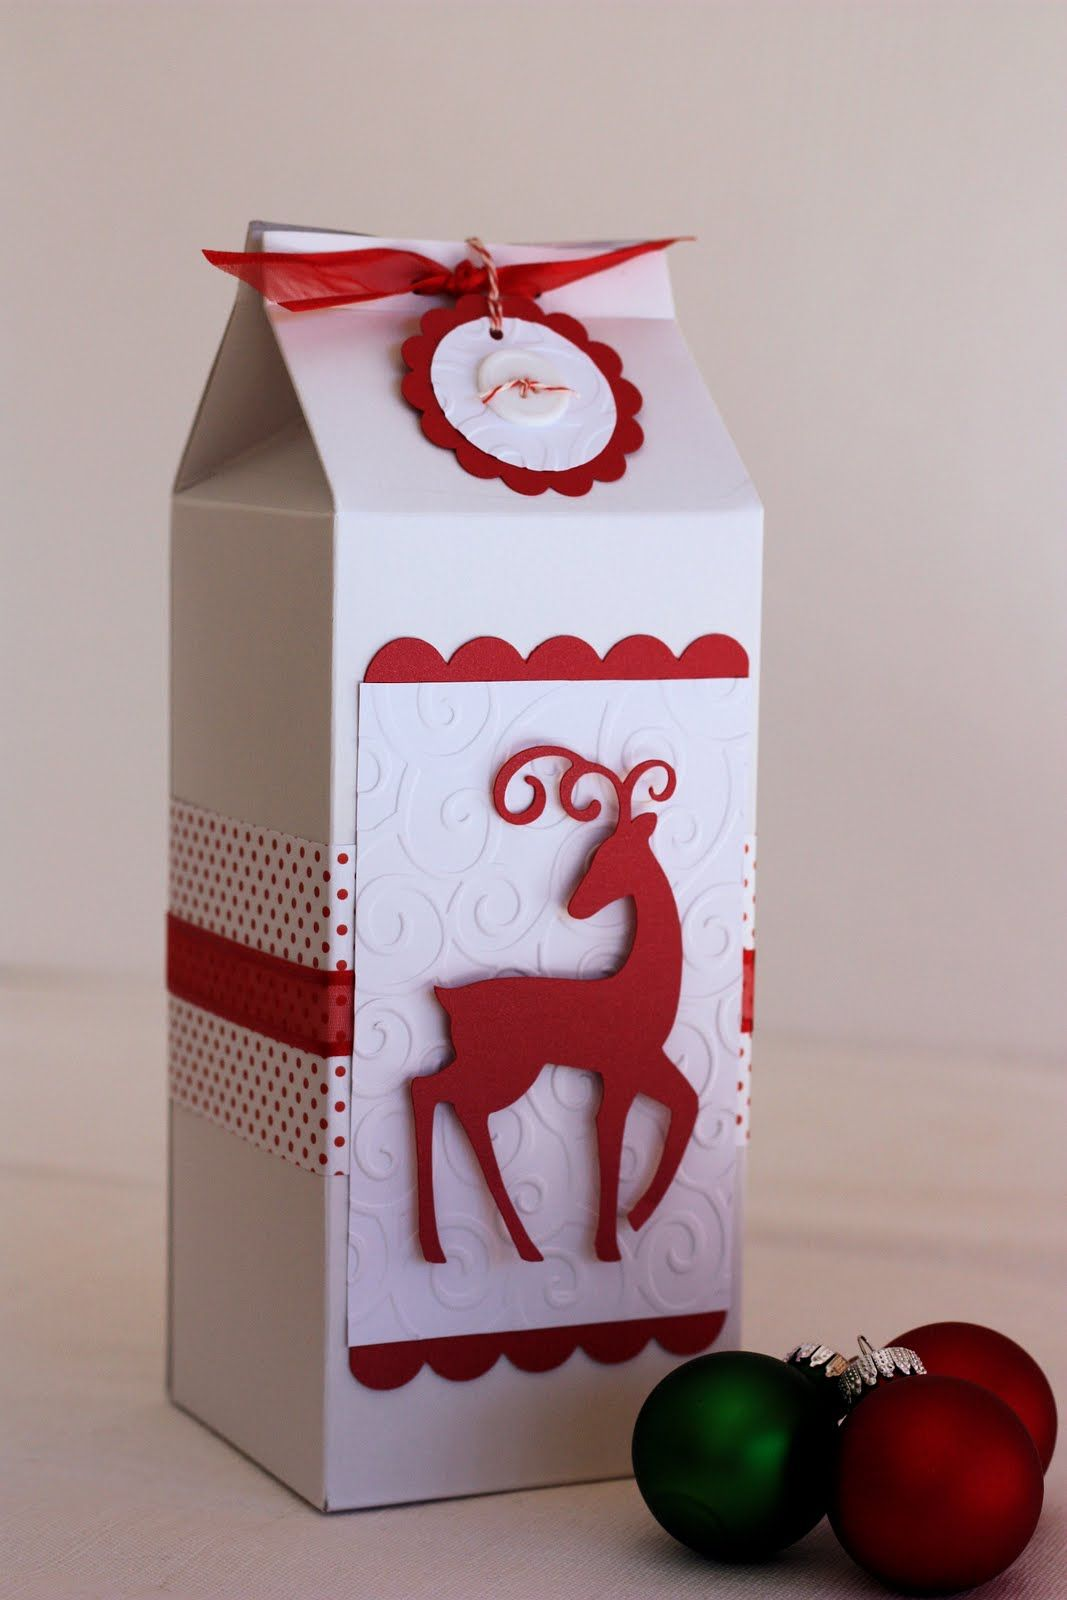 www.dolcipattini.it - A Spoonful of Sugar: Milk Carton Packaging